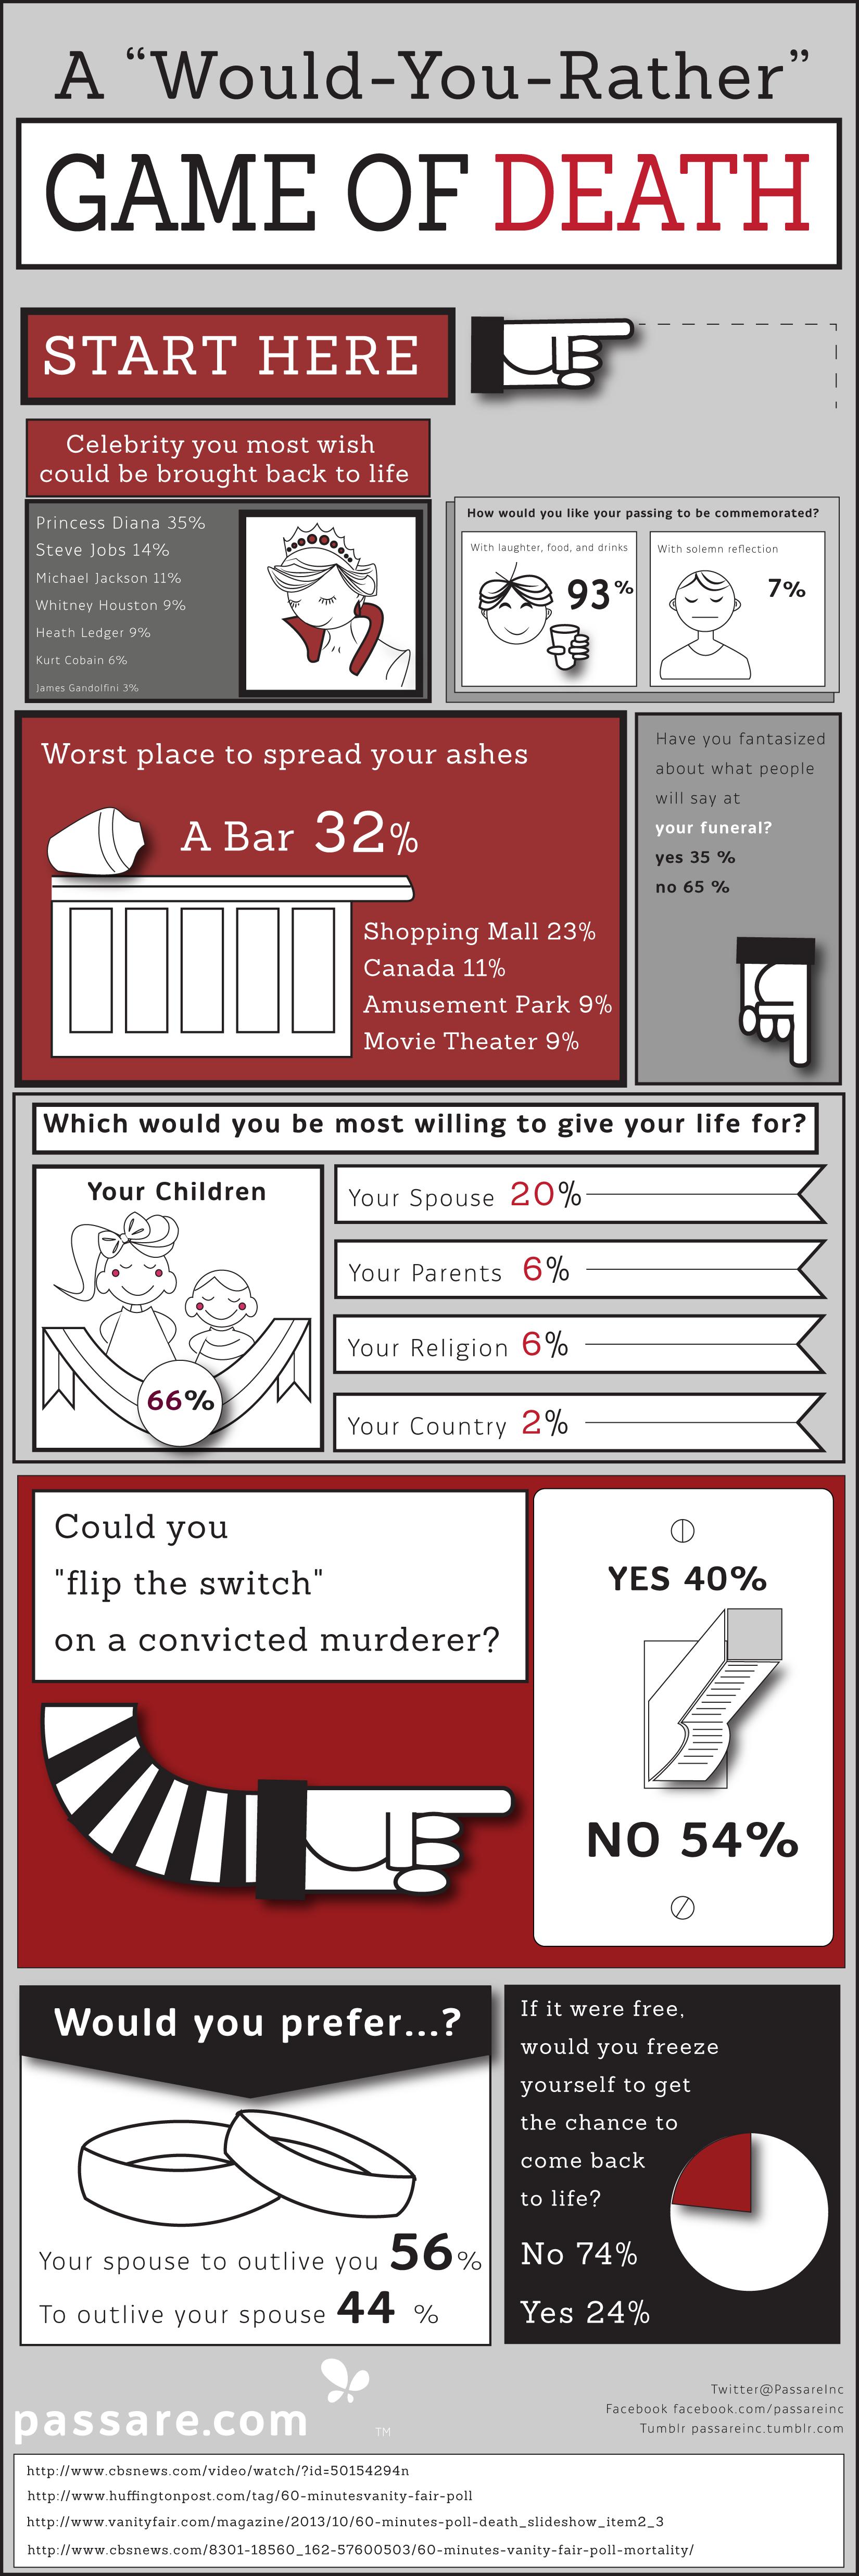 04 Vanity-Fair-Infographic-Passare